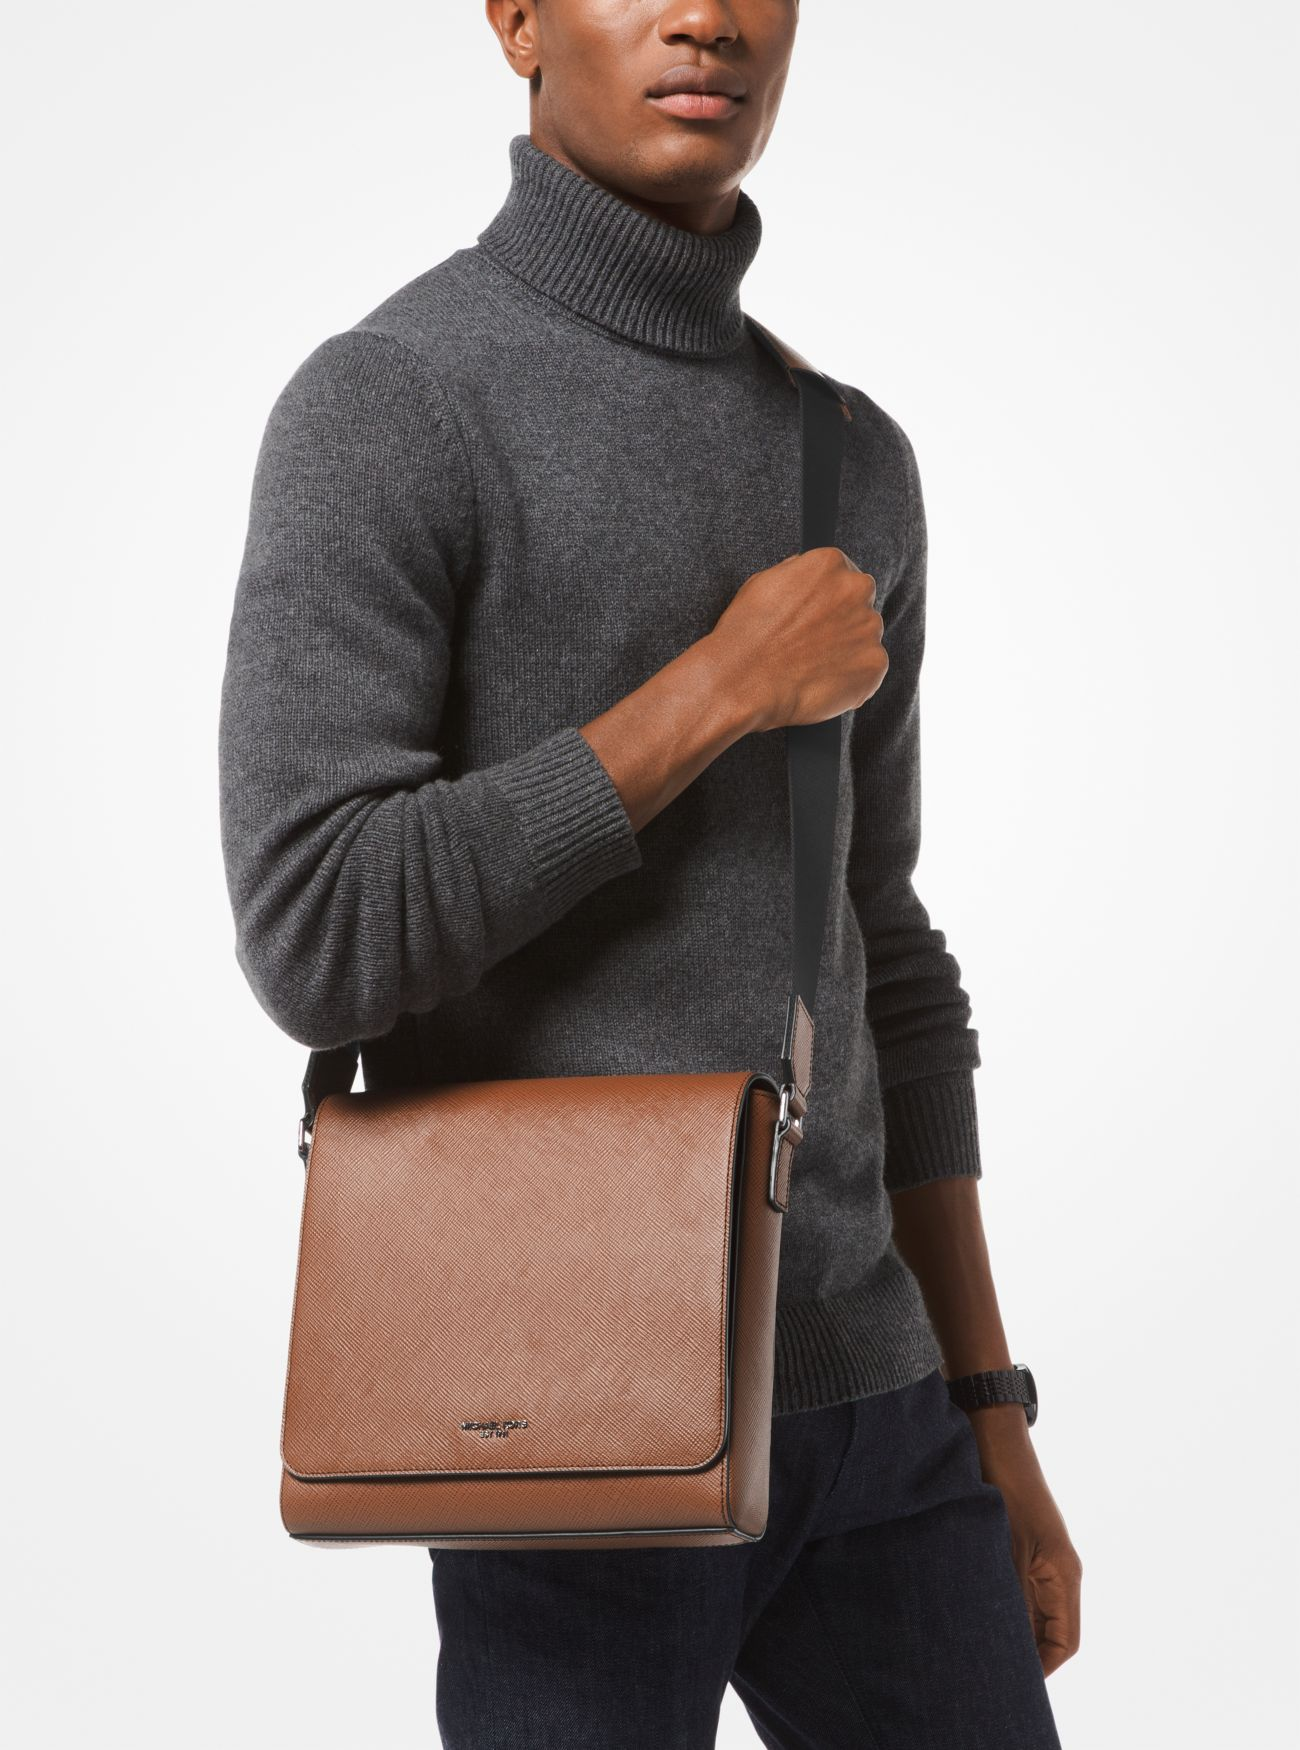 63cf4a20f3c8c ... Harrison Medium Leather Messenger Bag. Michael Kors Mens